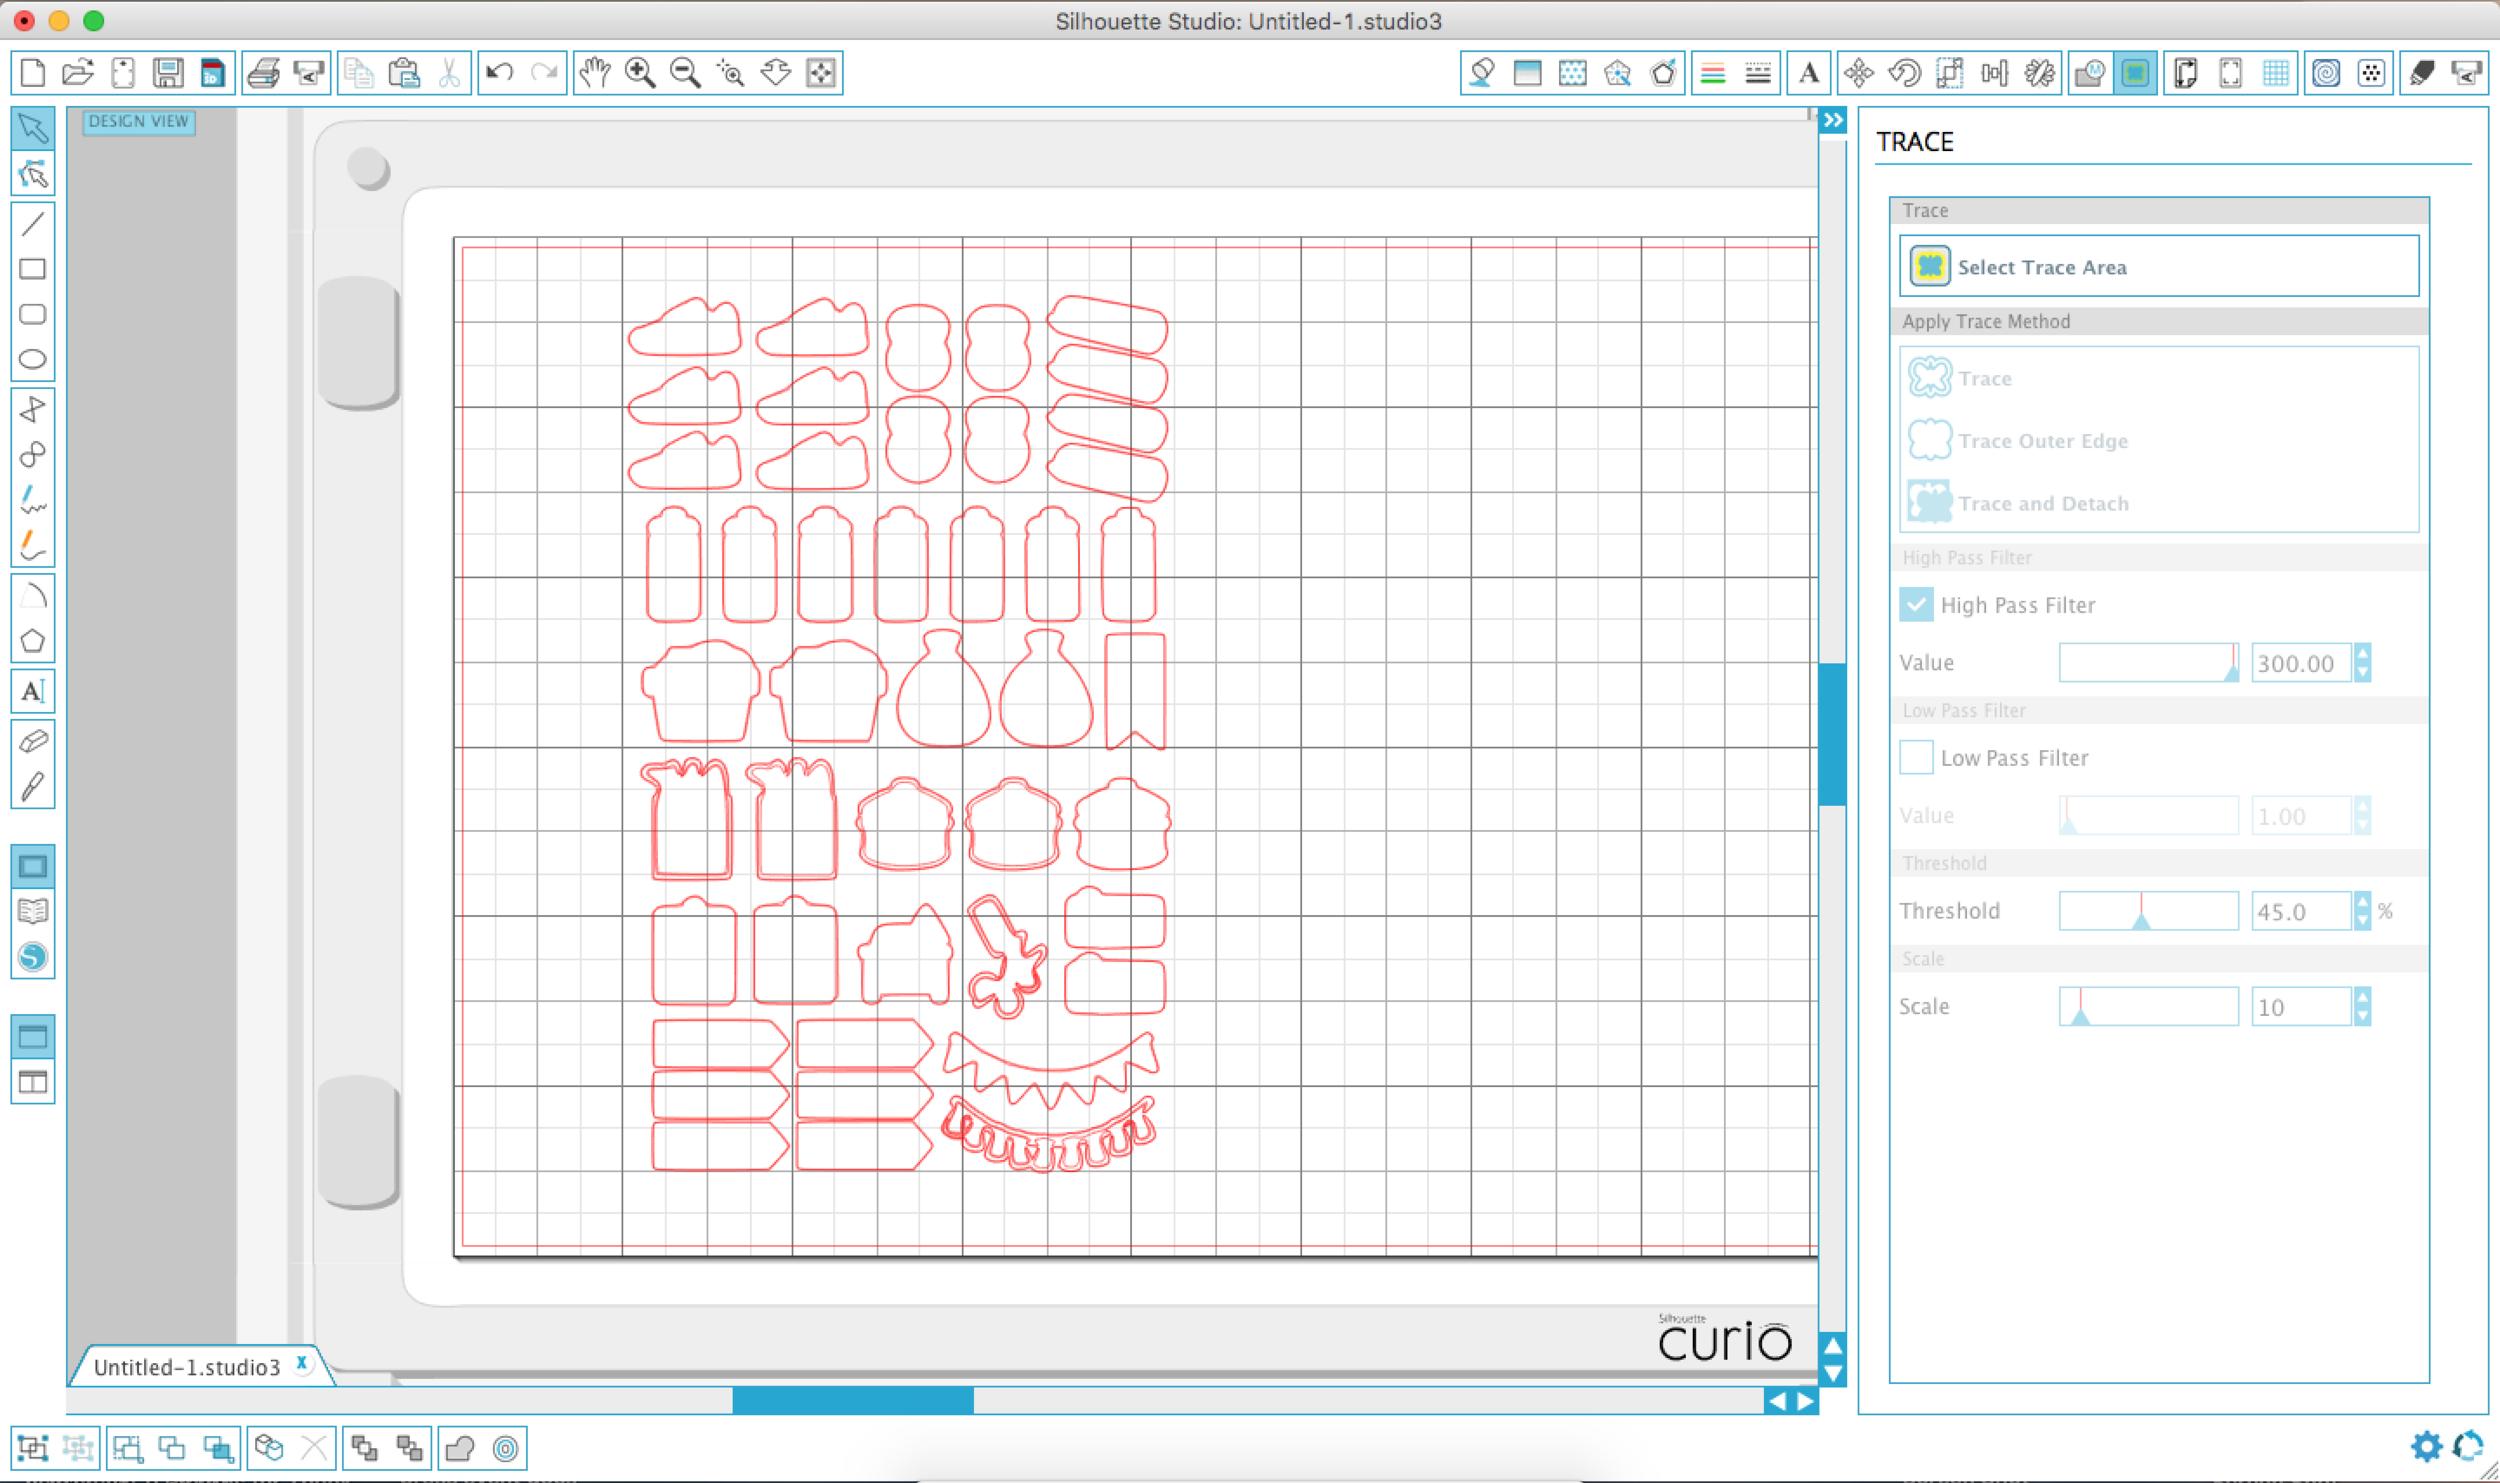 Step 4. Cut sticker borders in Silhouette software